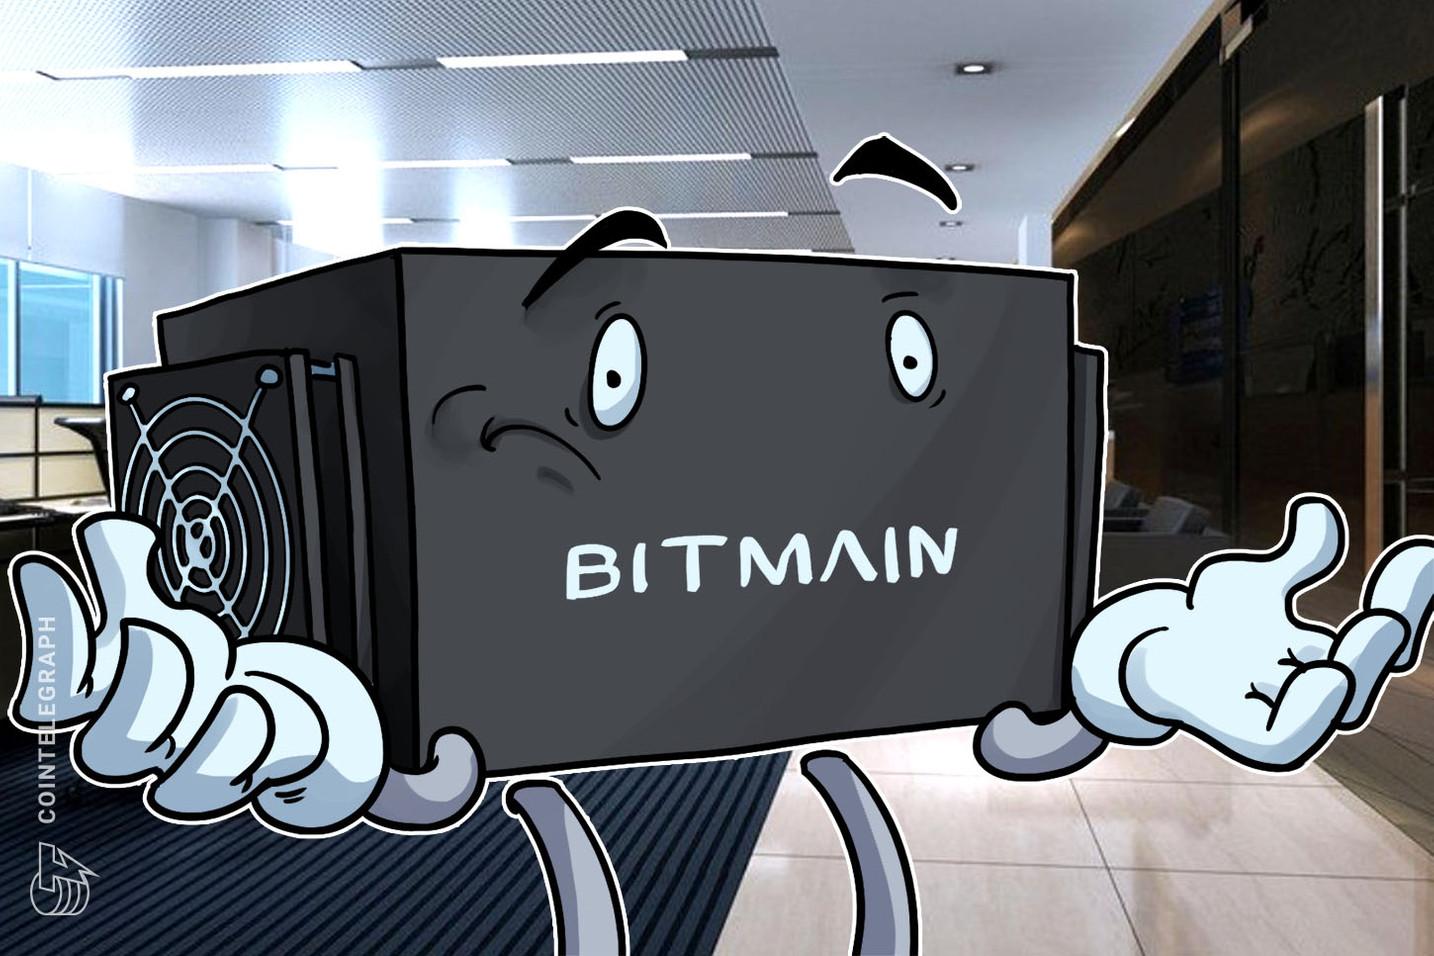 Bitmain: Antrag für Börsengang läuft aus, Mining-Konzern zieht trotzdem positives Fazit